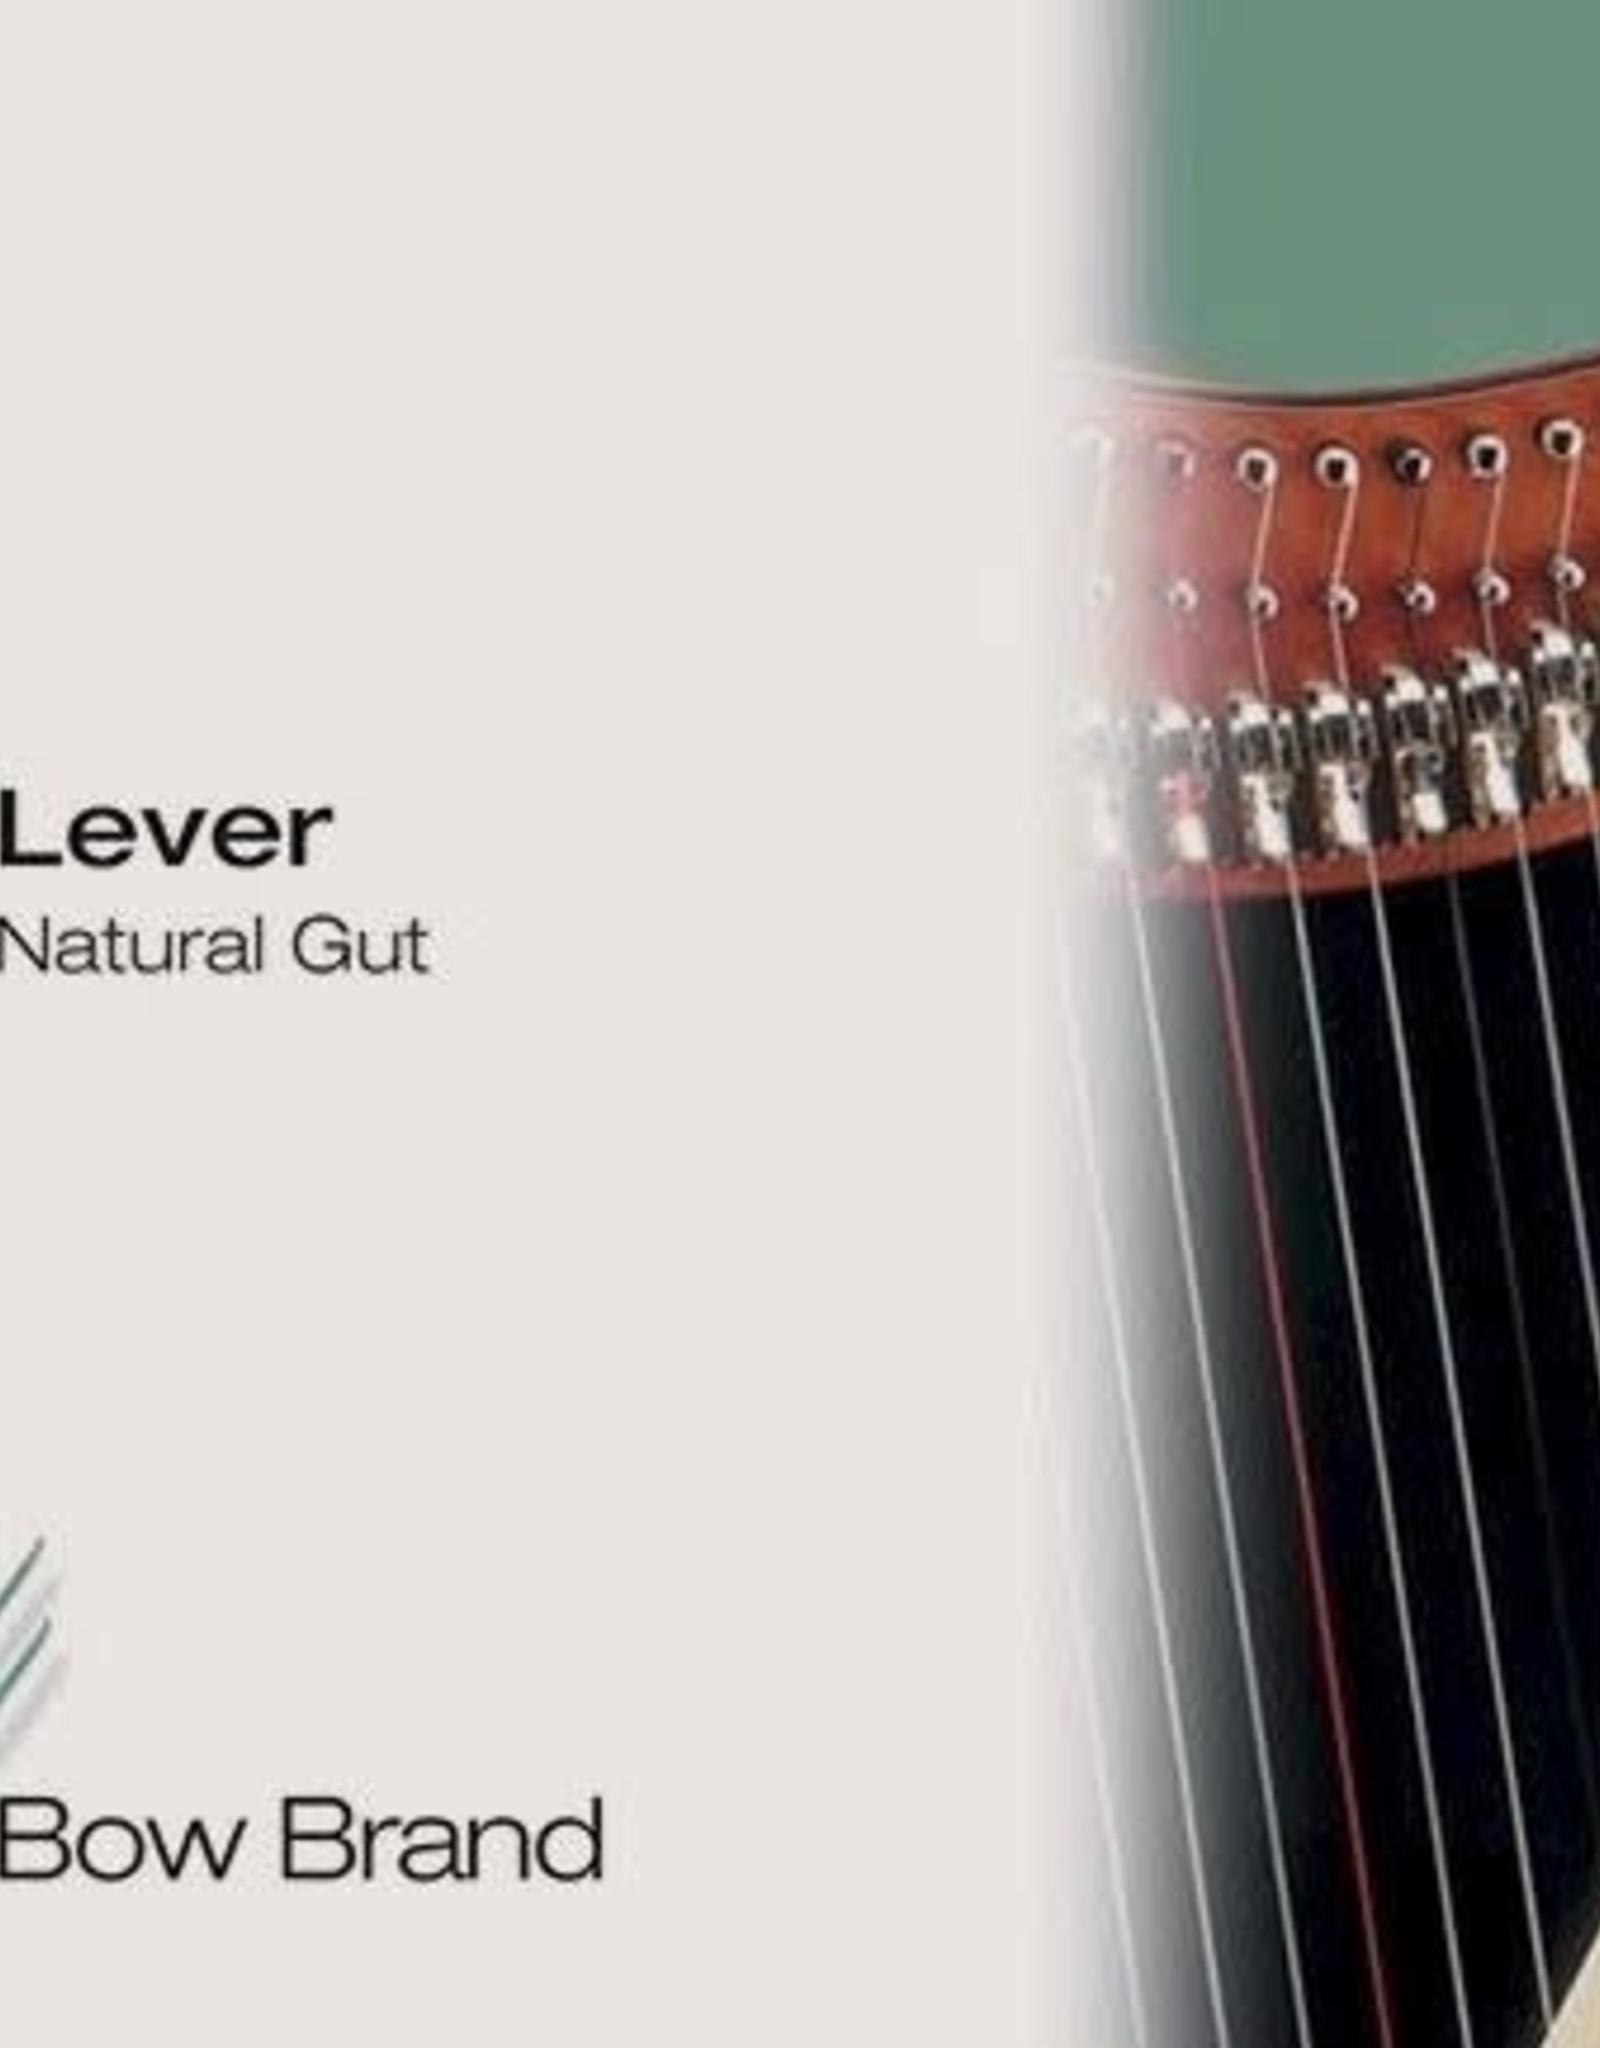 BOW BRAND  klep darm - lever GUT 29/5 mi